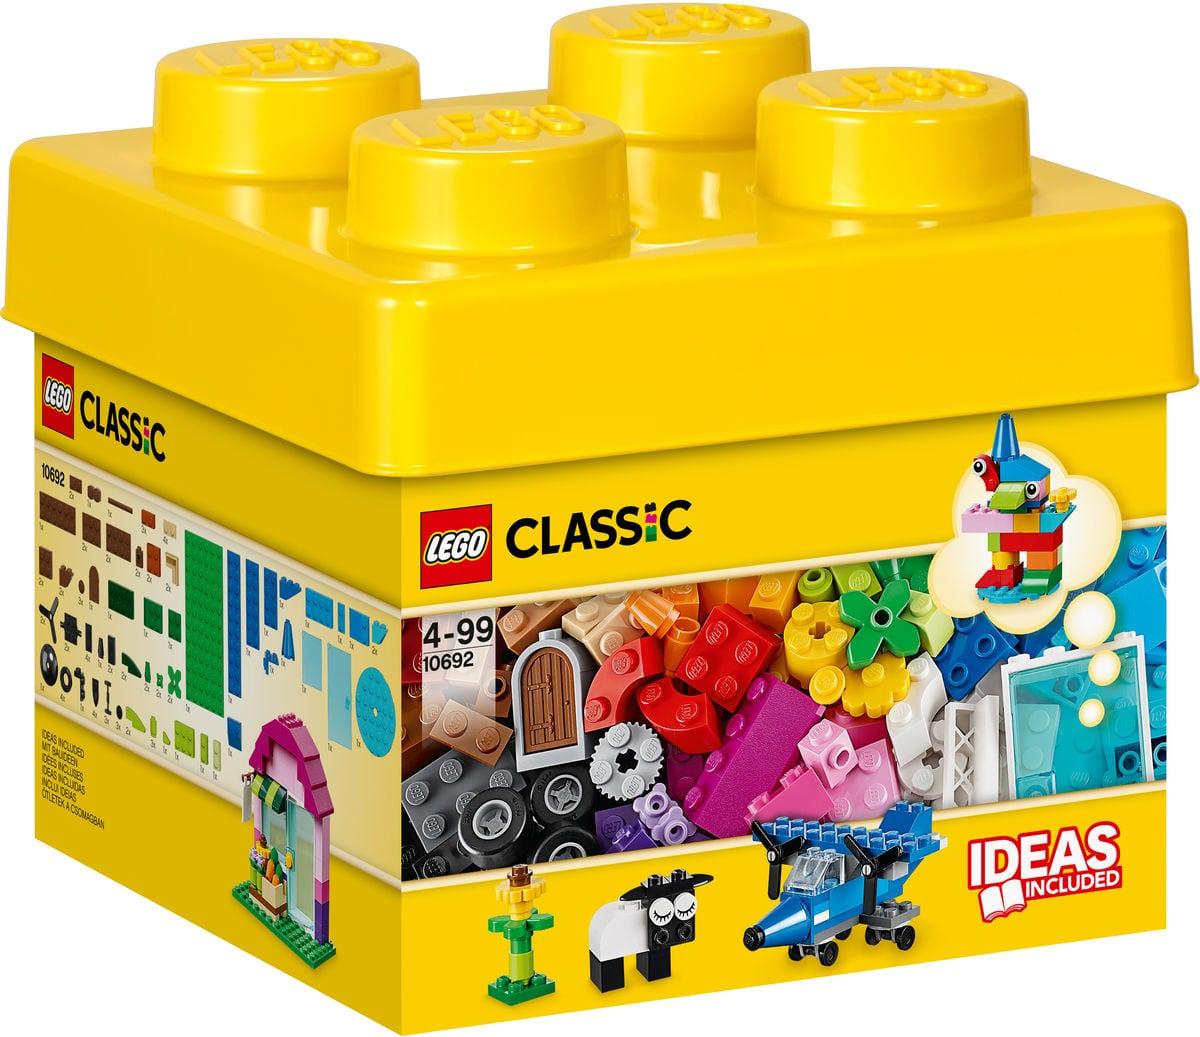 LEGO® Classic Bausteine - Set 10692